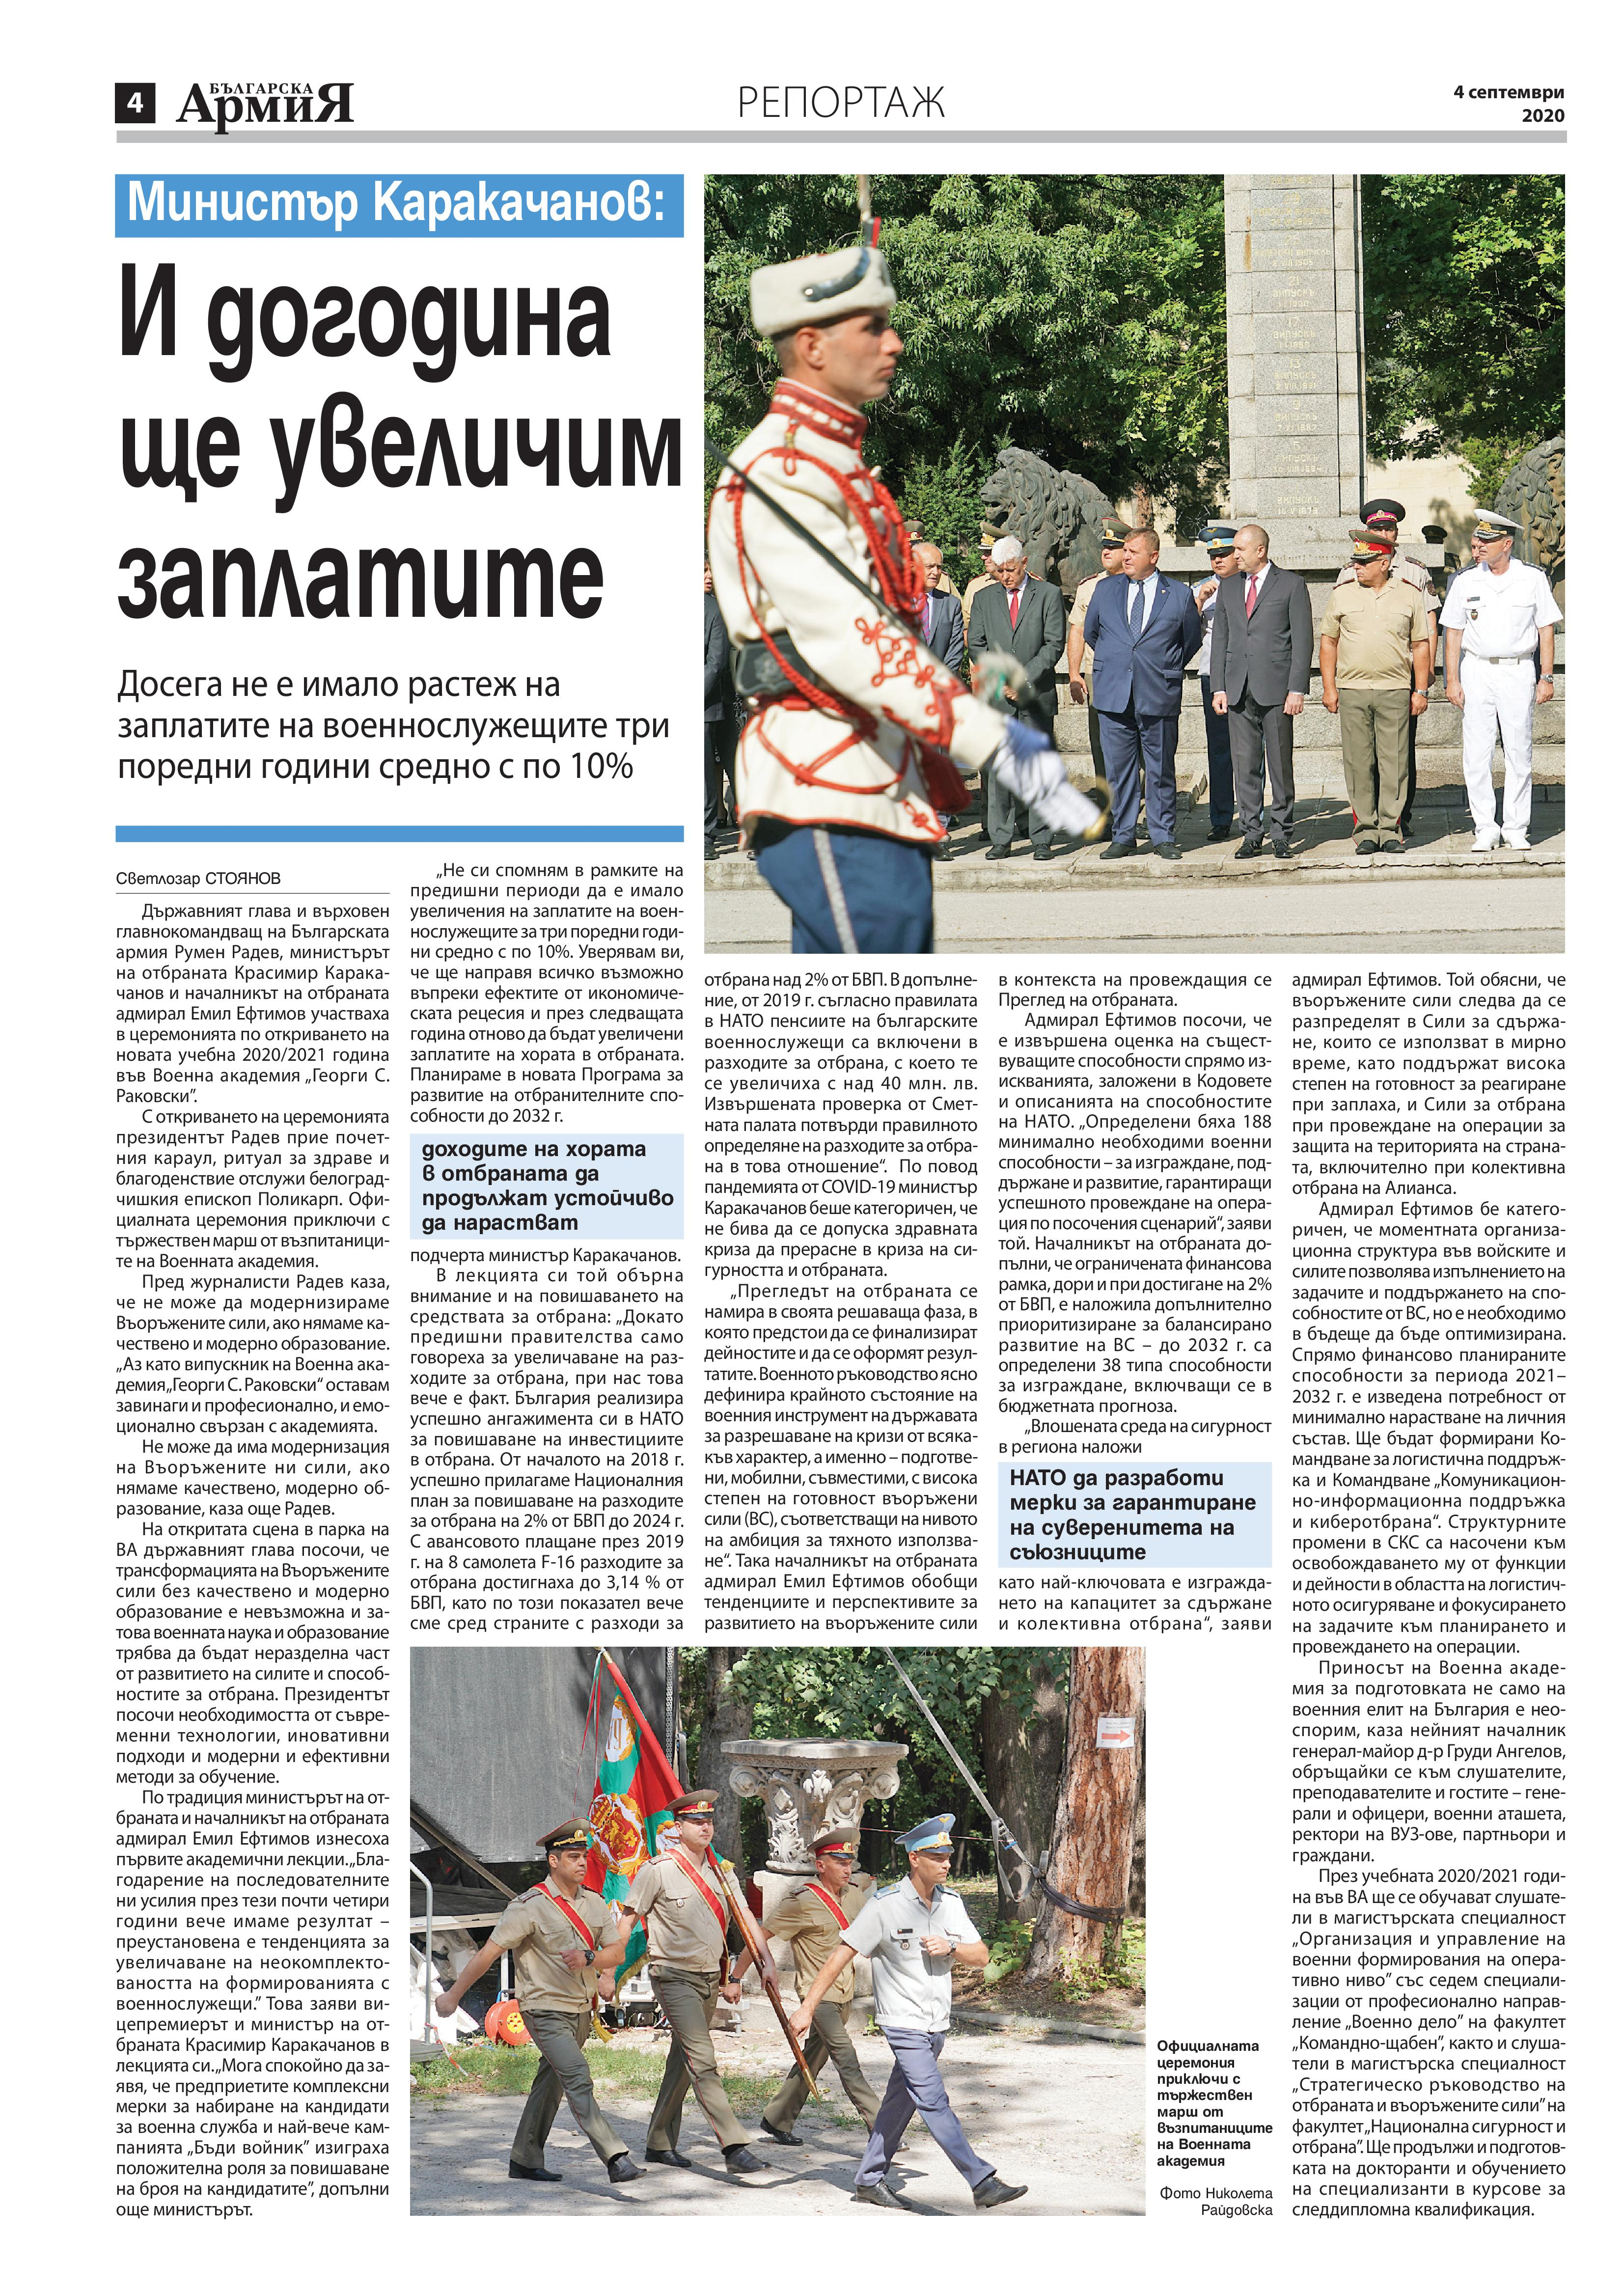 https://www.armymedia.bg/wp-content/uploads/2015/06/04-38.jpg